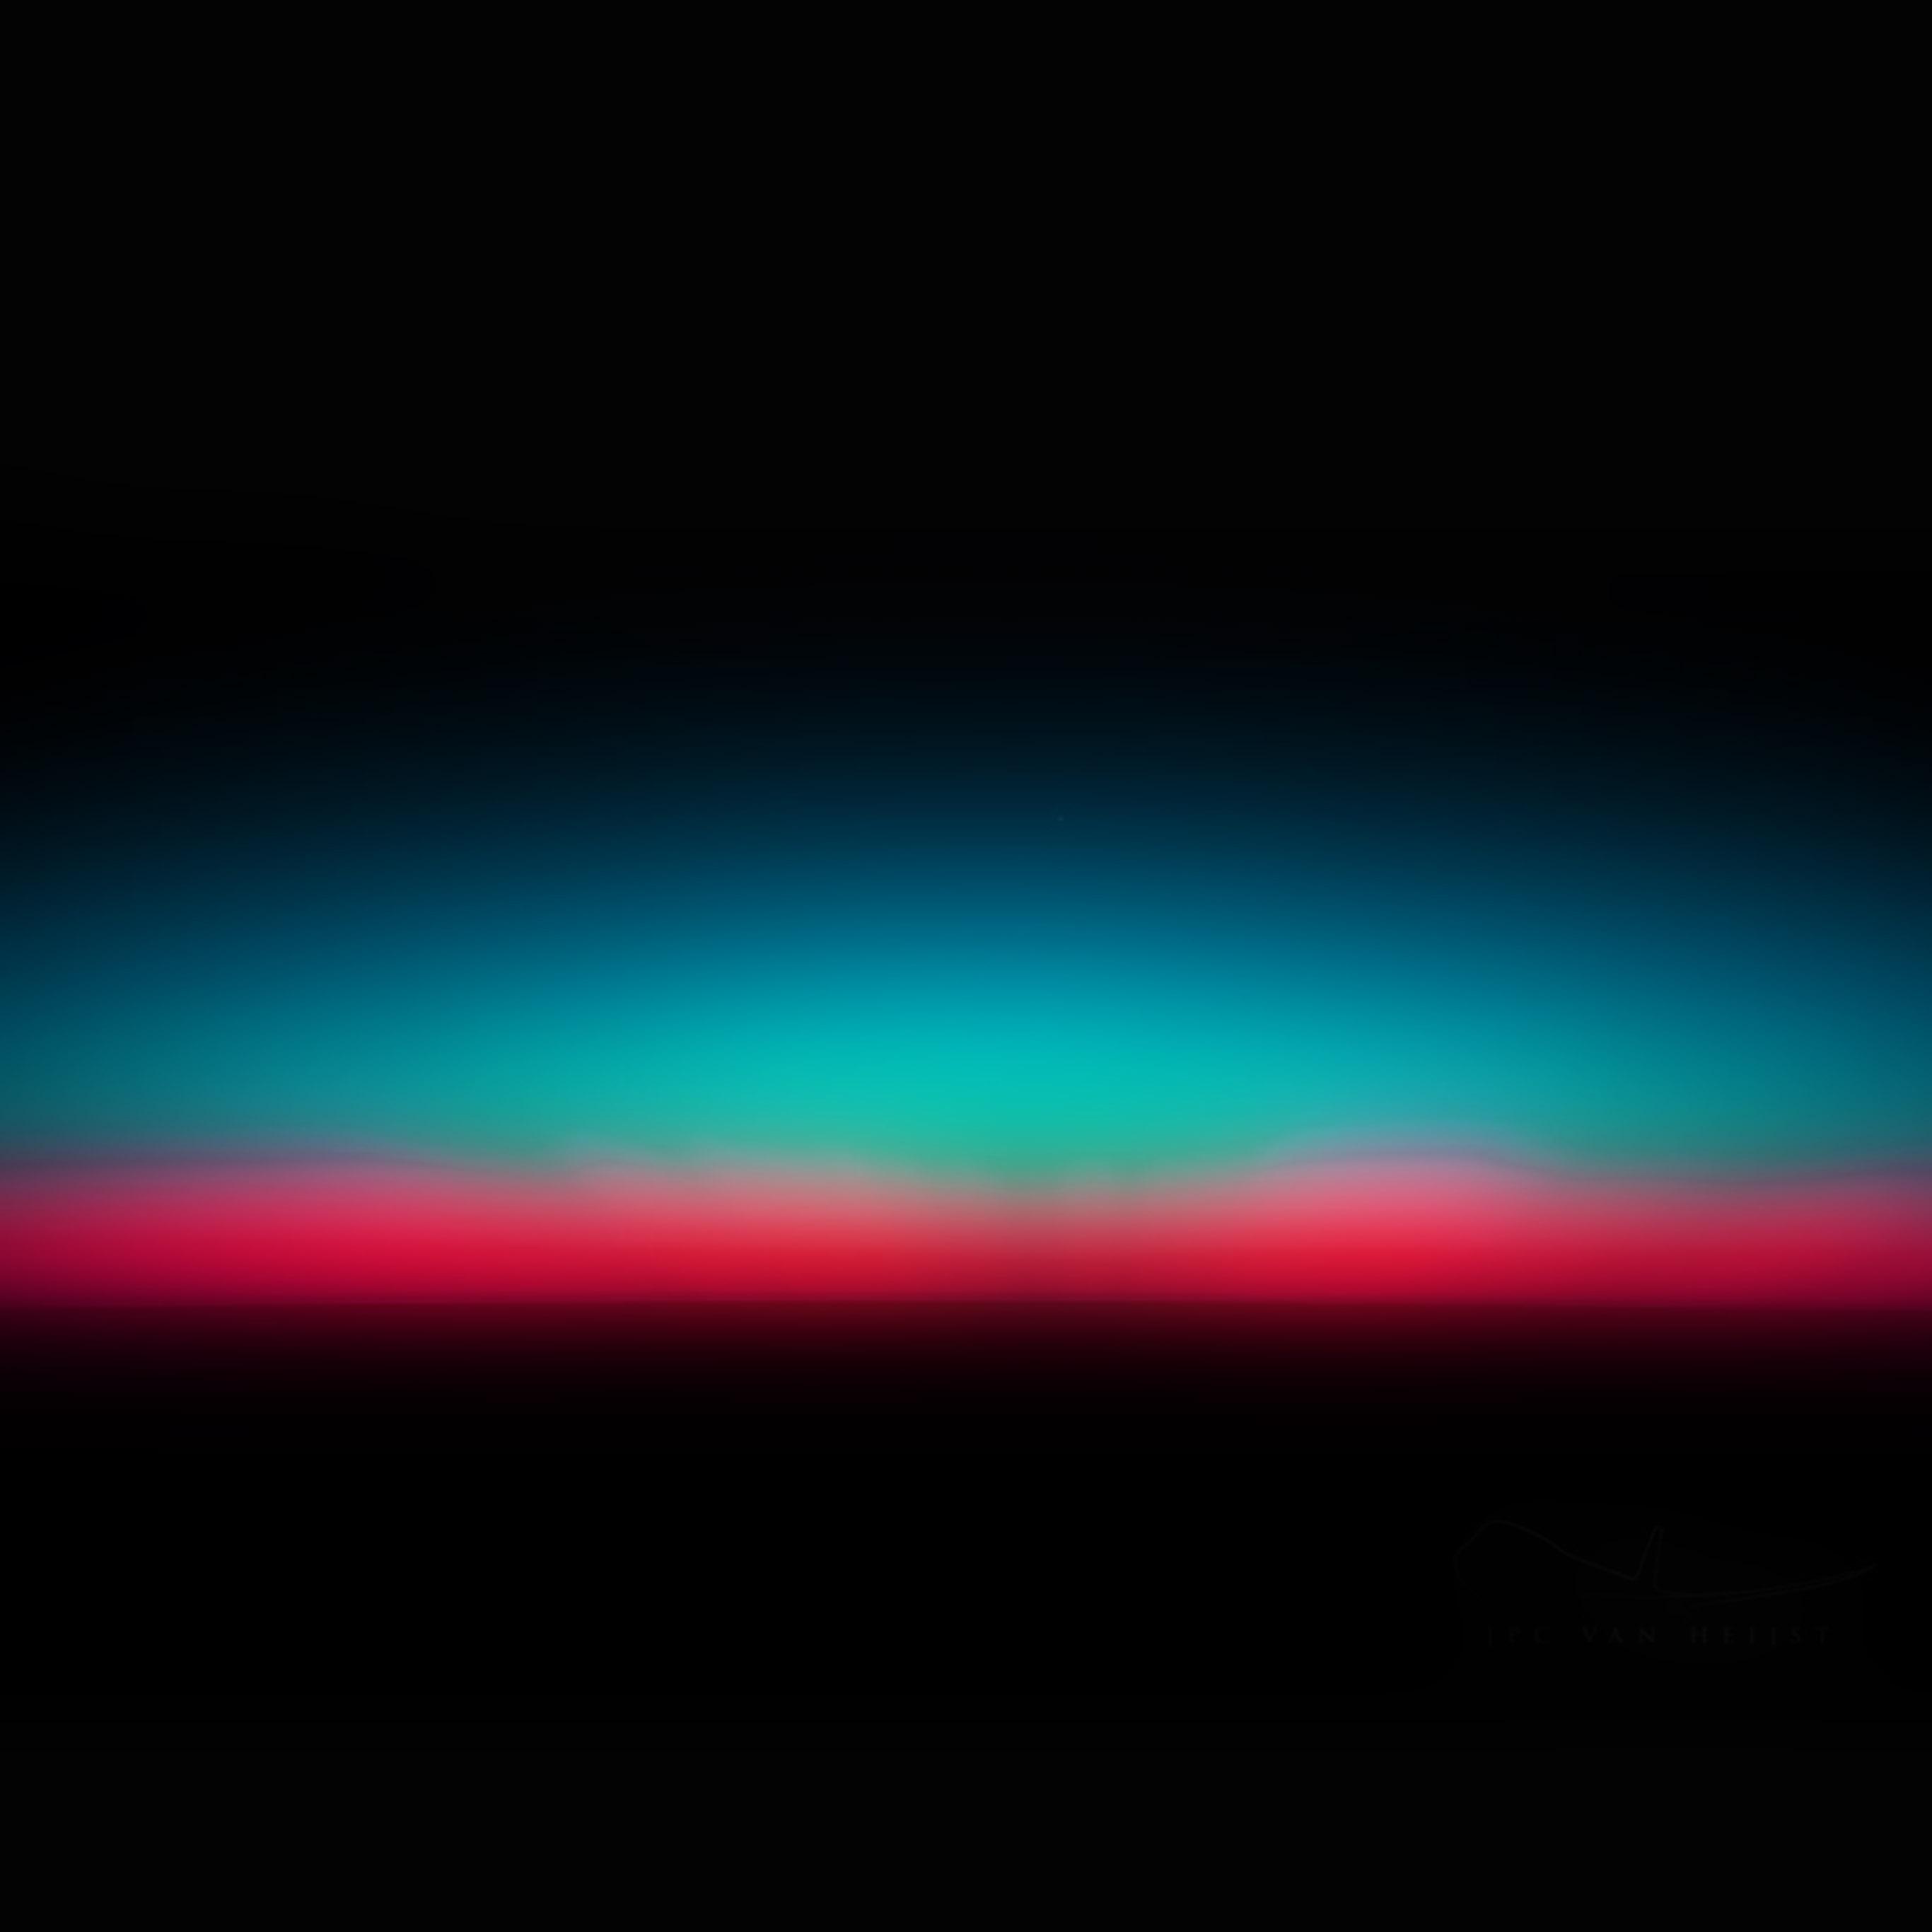 I Love Papers Sk36 Sunset Dark Red Green Horizontal Blur Gradation